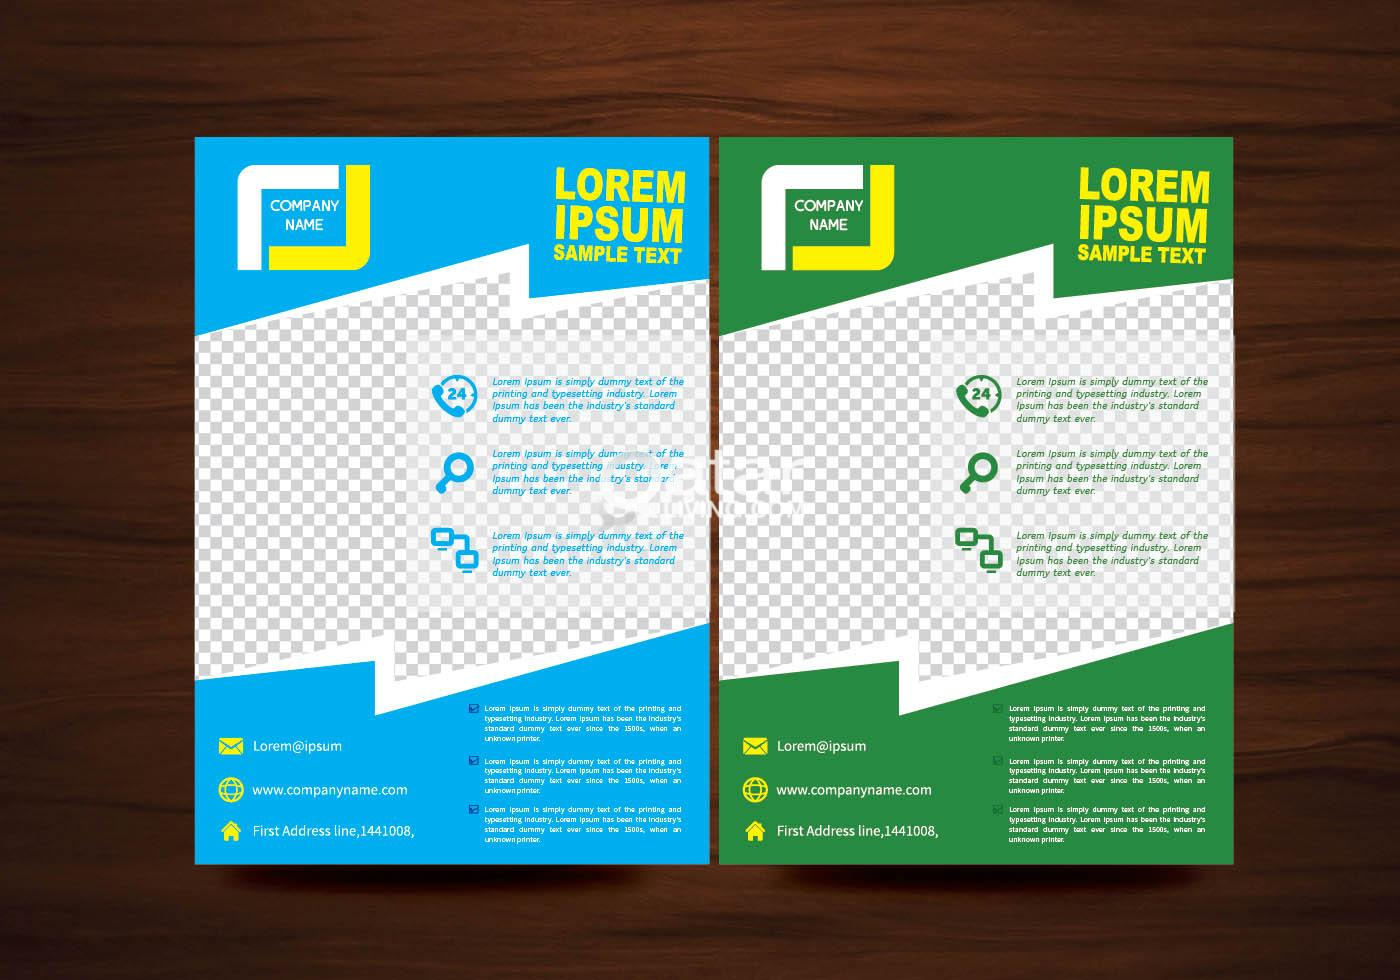 Freelance logo designerbrochurebusiness carddesignsflyerproduct freelance logo designerbrochurebusiness carddesignsflyerproduct photography c designs qatar living reheart Choice Image